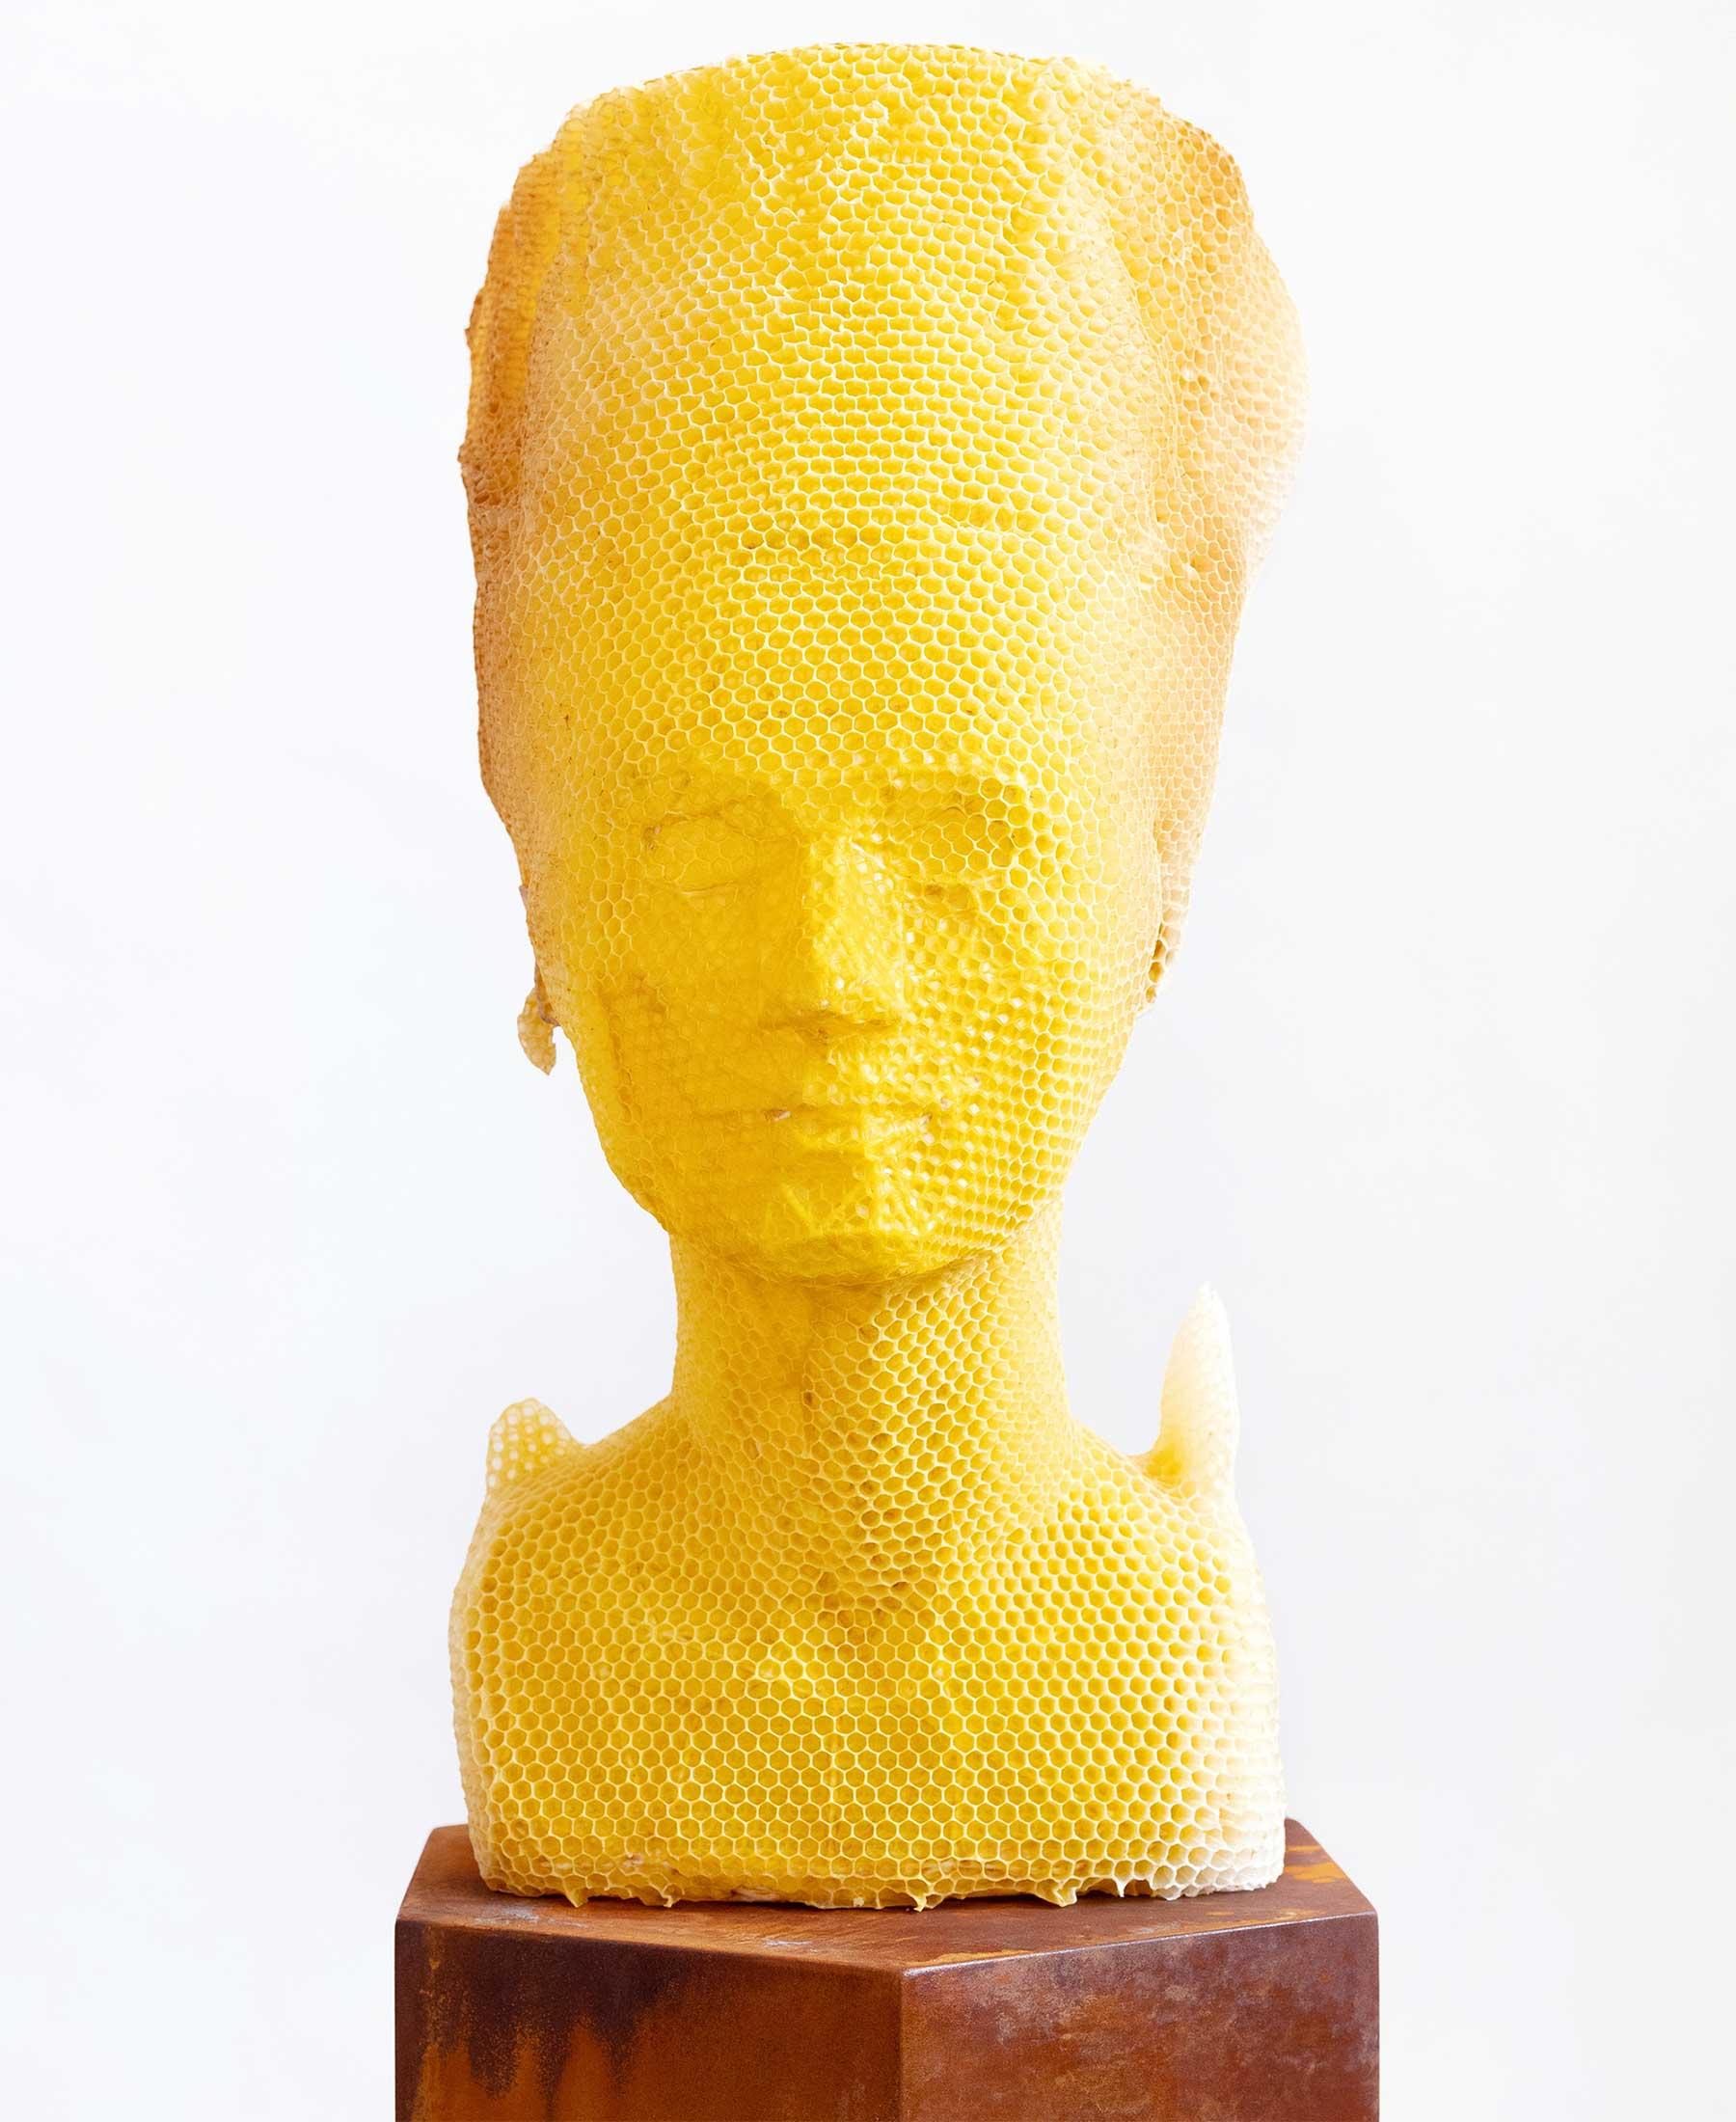 Bienenwachs-Skulpturen von Tomáš Libertíny Tomas-Libertiny-Bienenwachs-skulpturen_01